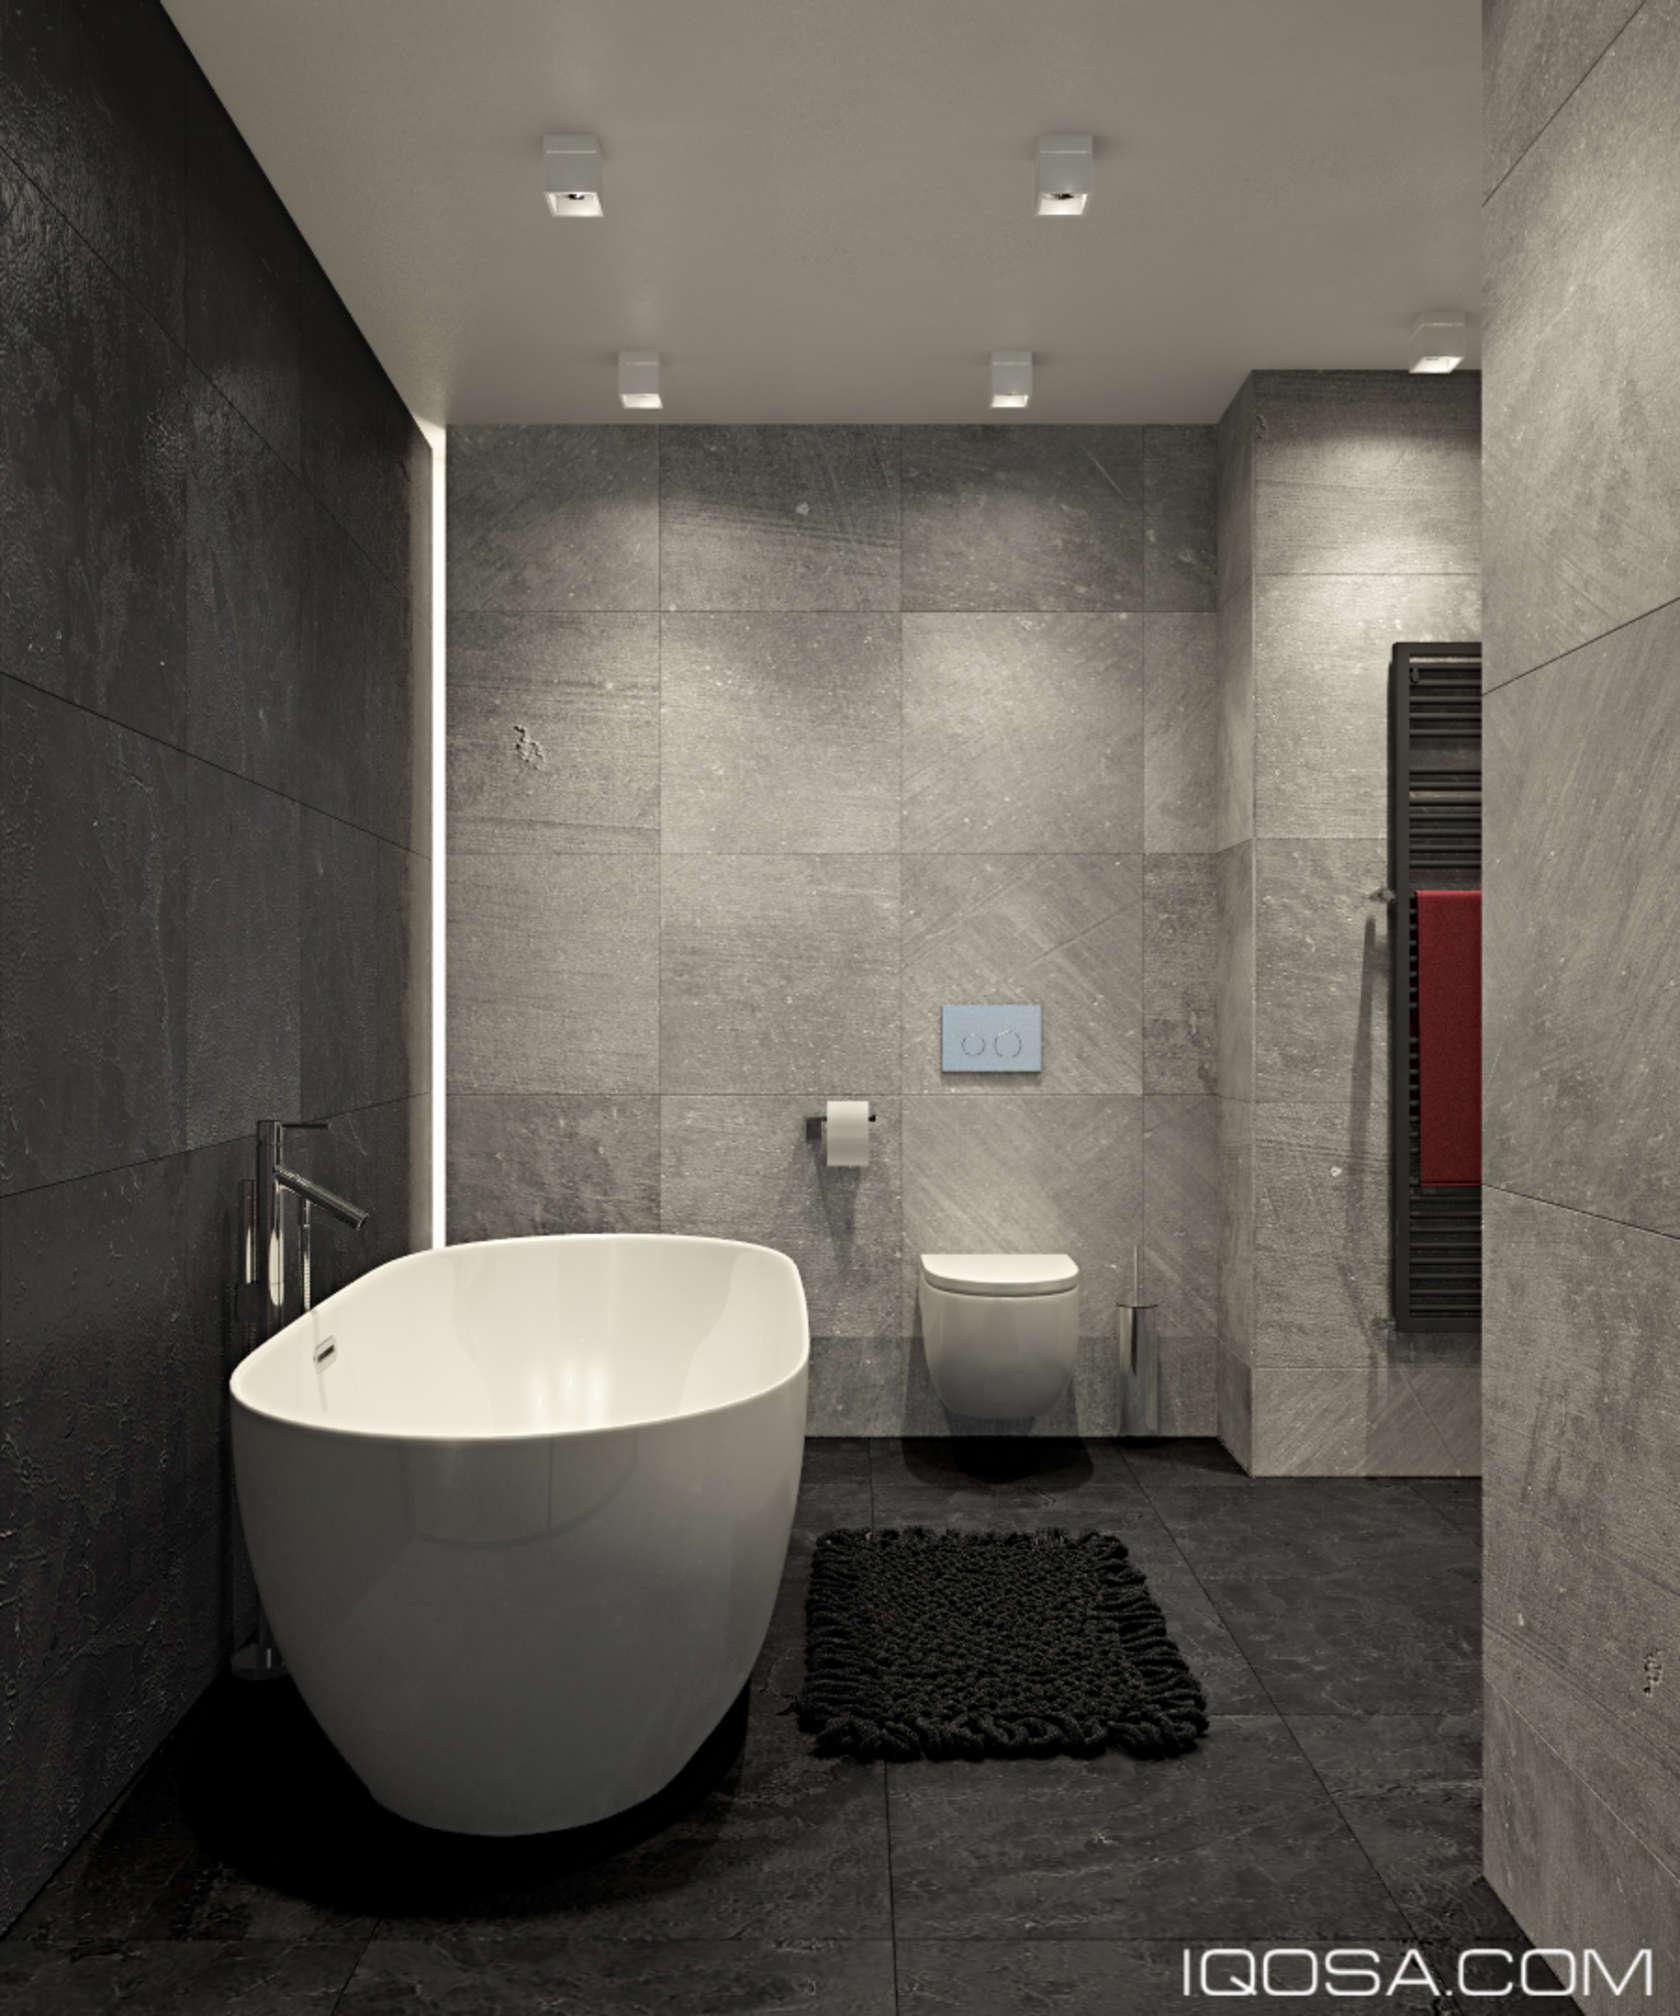 Luxury Small Studio Apartment Design Combined Modern And Minimalist Style Decor Looks Stunning